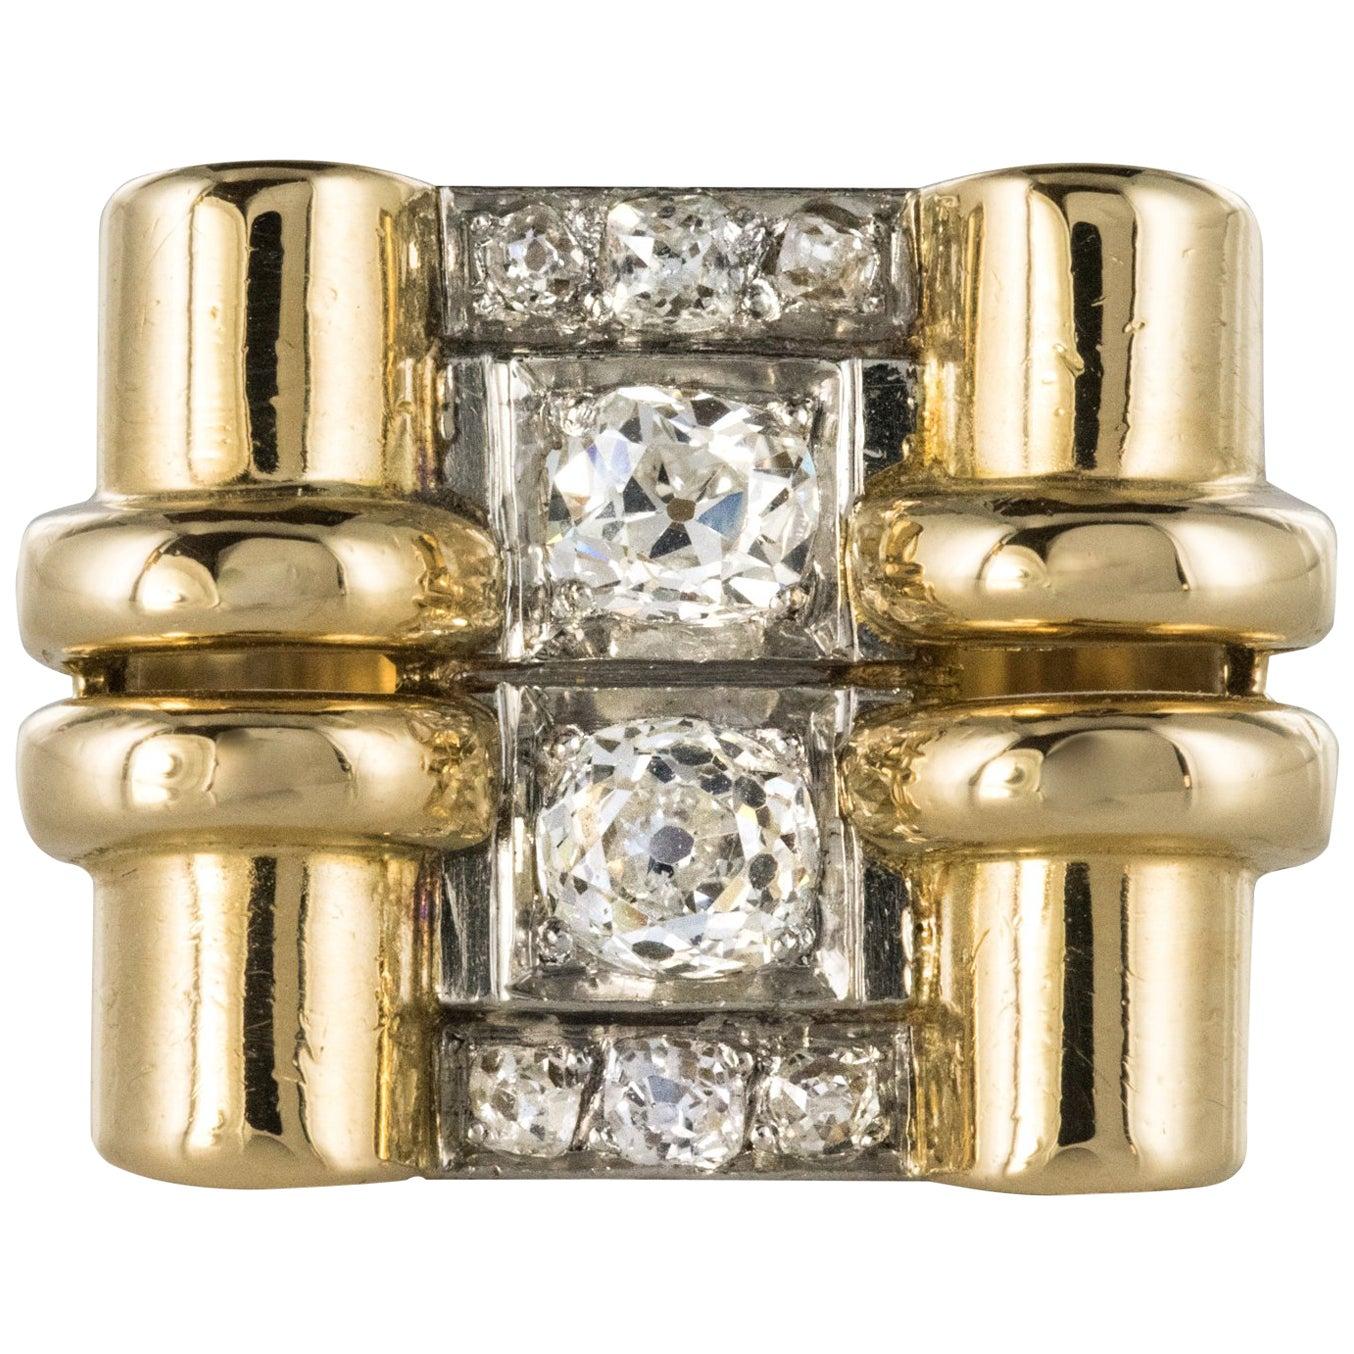 1940s Retro 0.60 Carat Diamond Yellow Gold Windings Tank Ring